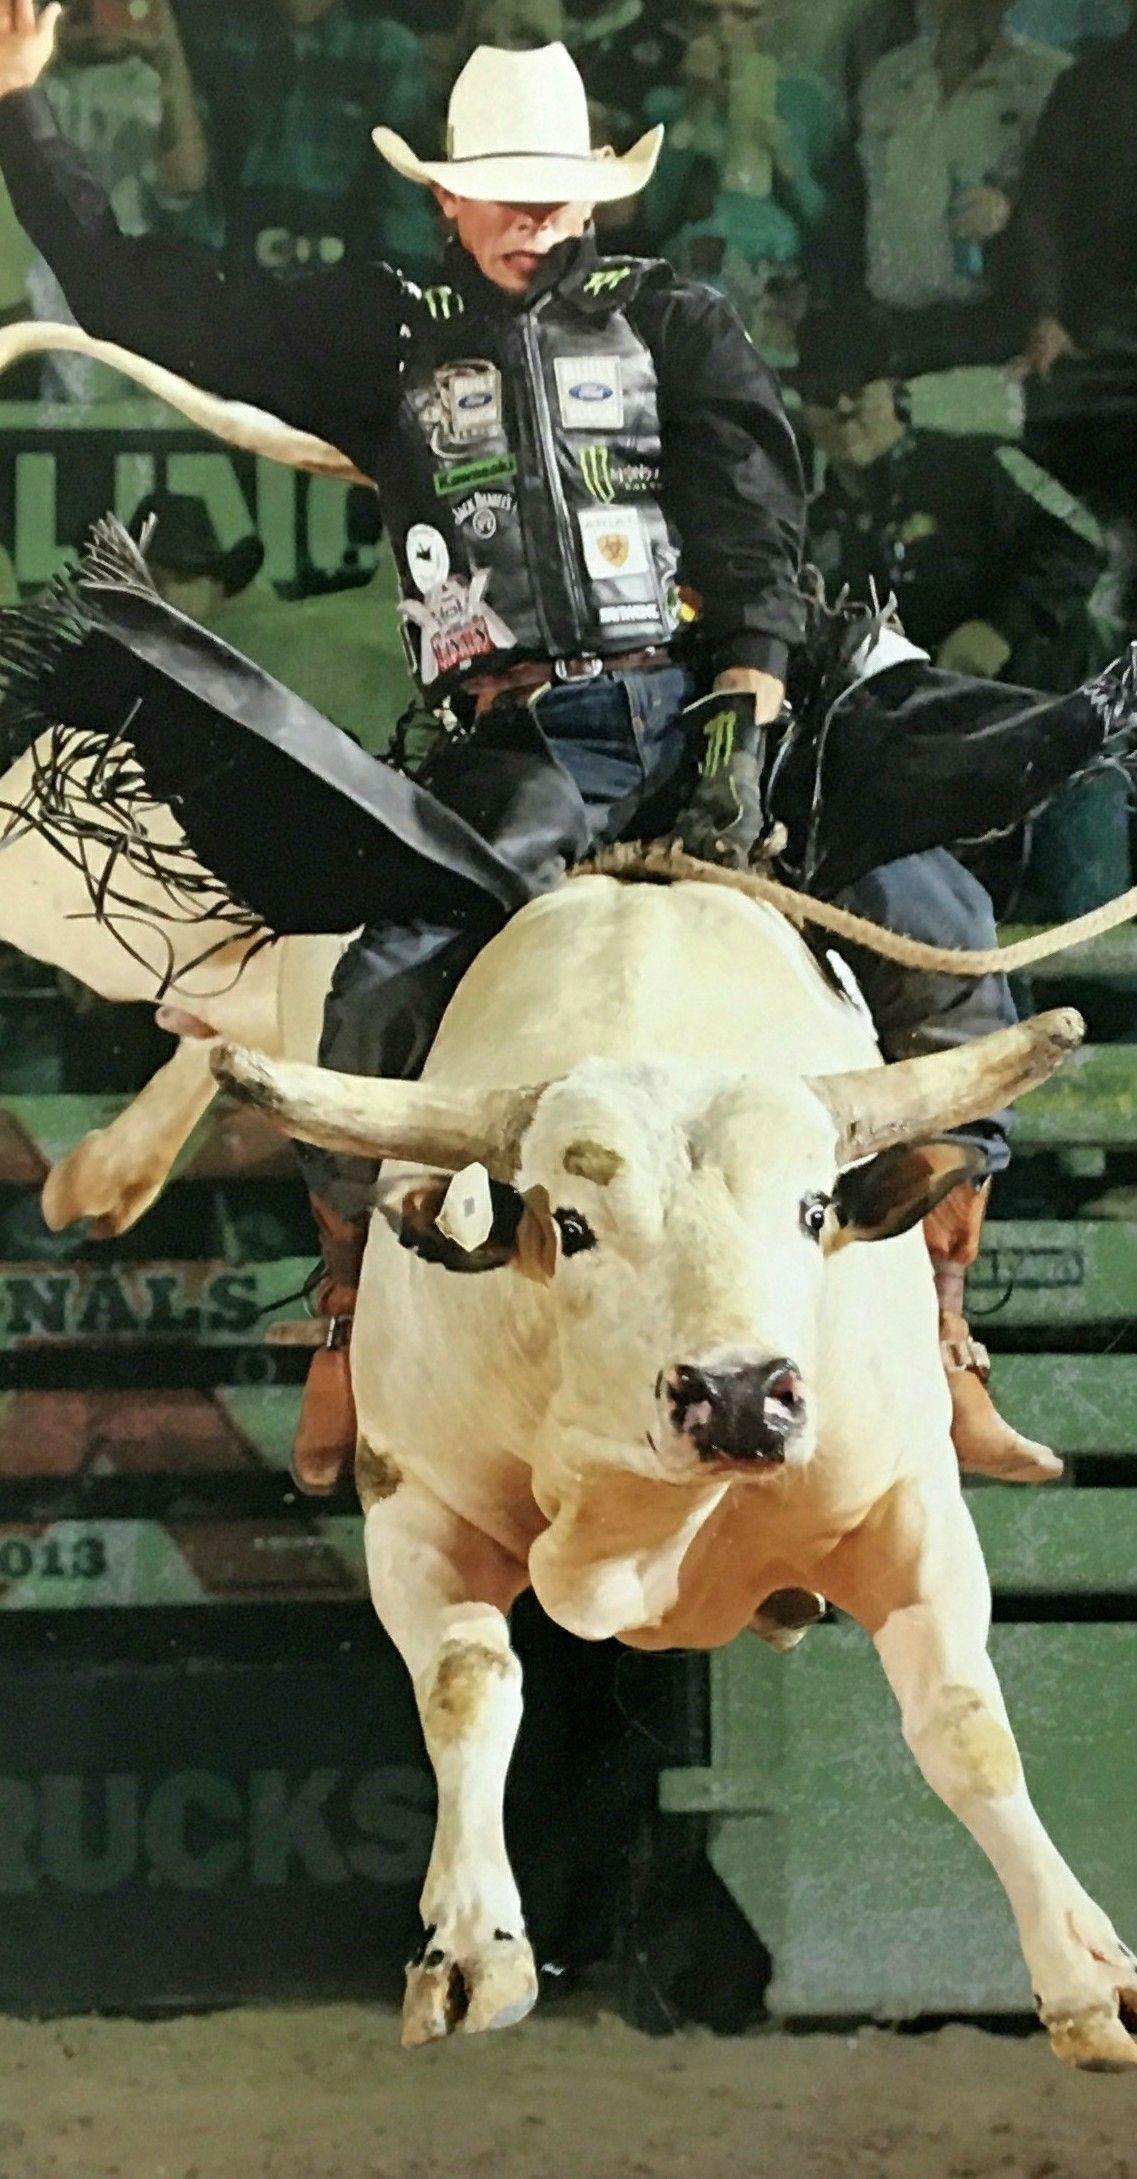 Pin De Fabricio Julio Em Bull Riders Montaria Em Touro